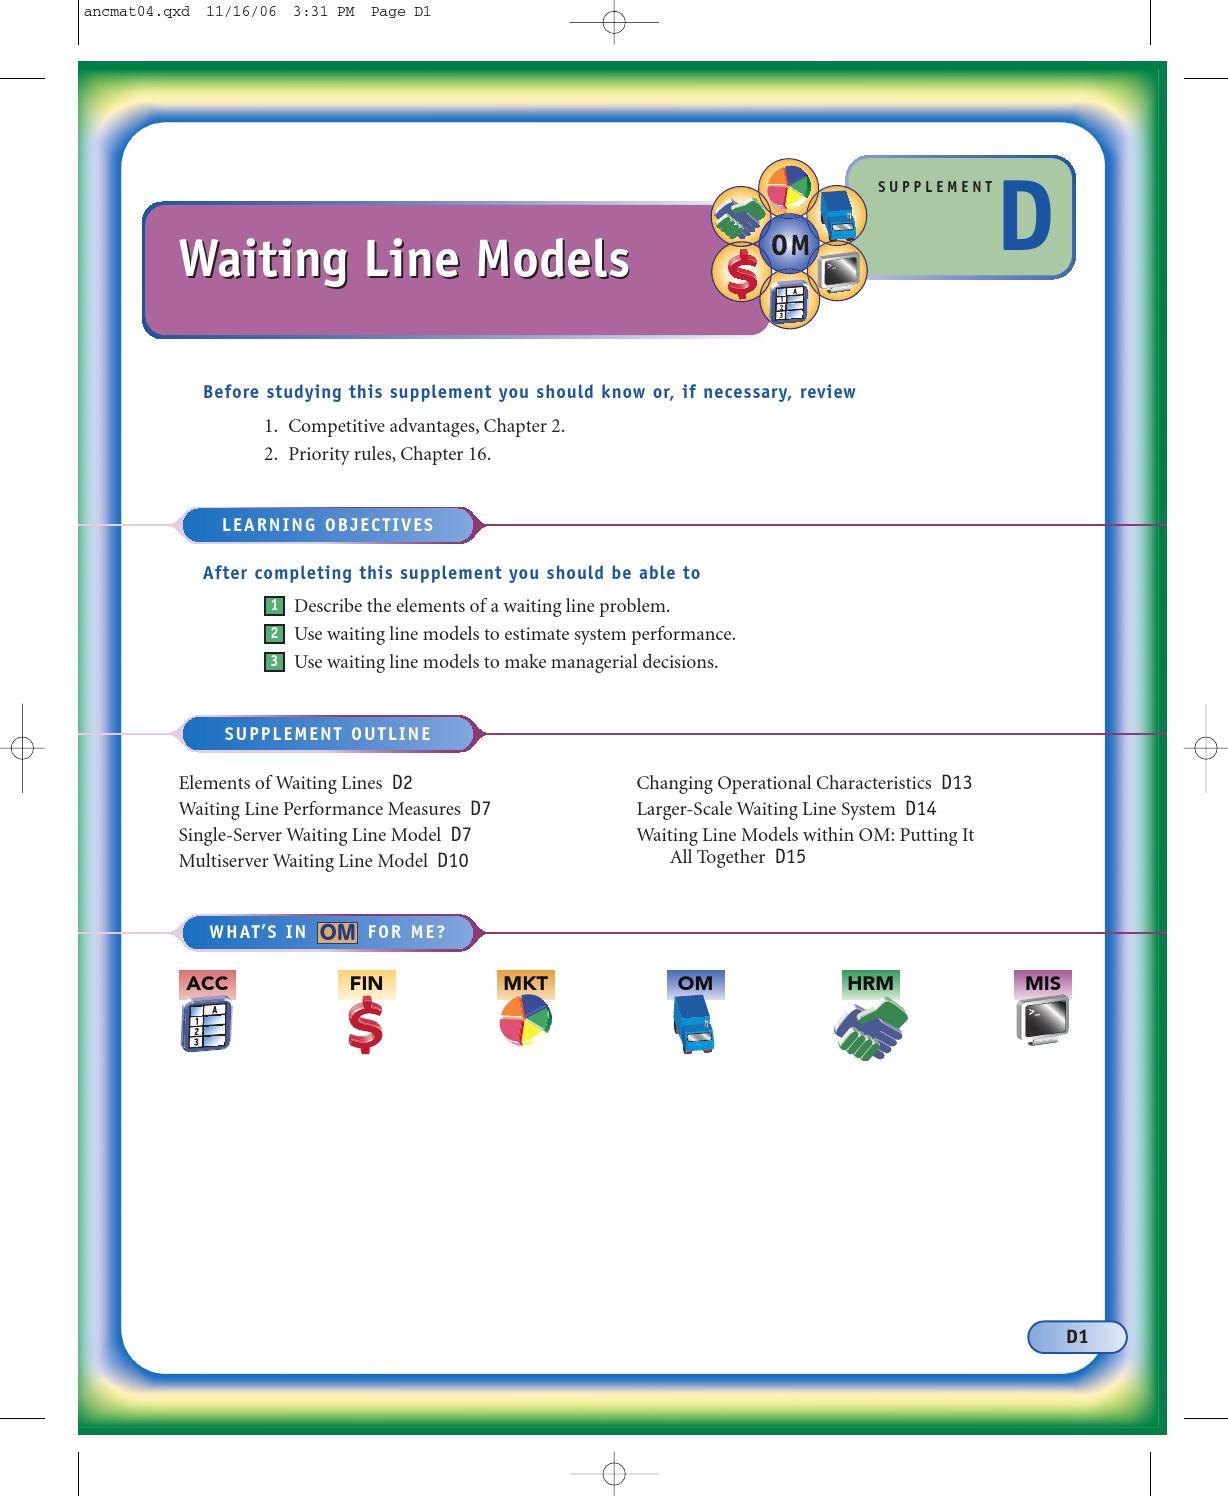 explain the single-server and multi-server waiting line models